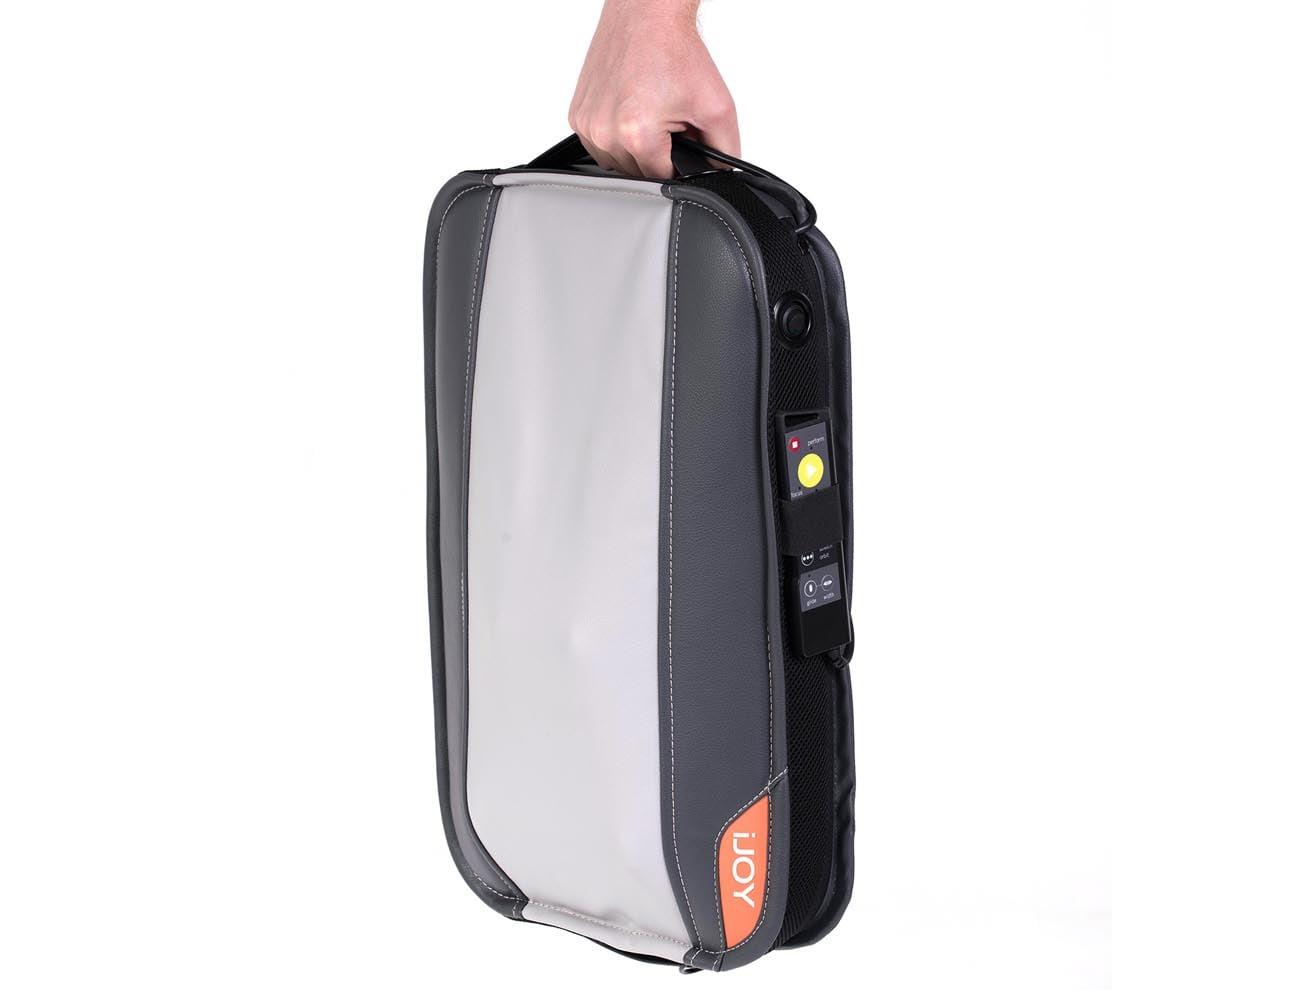 iJoy Massage Anywhere Portable Deep Tissue Massager